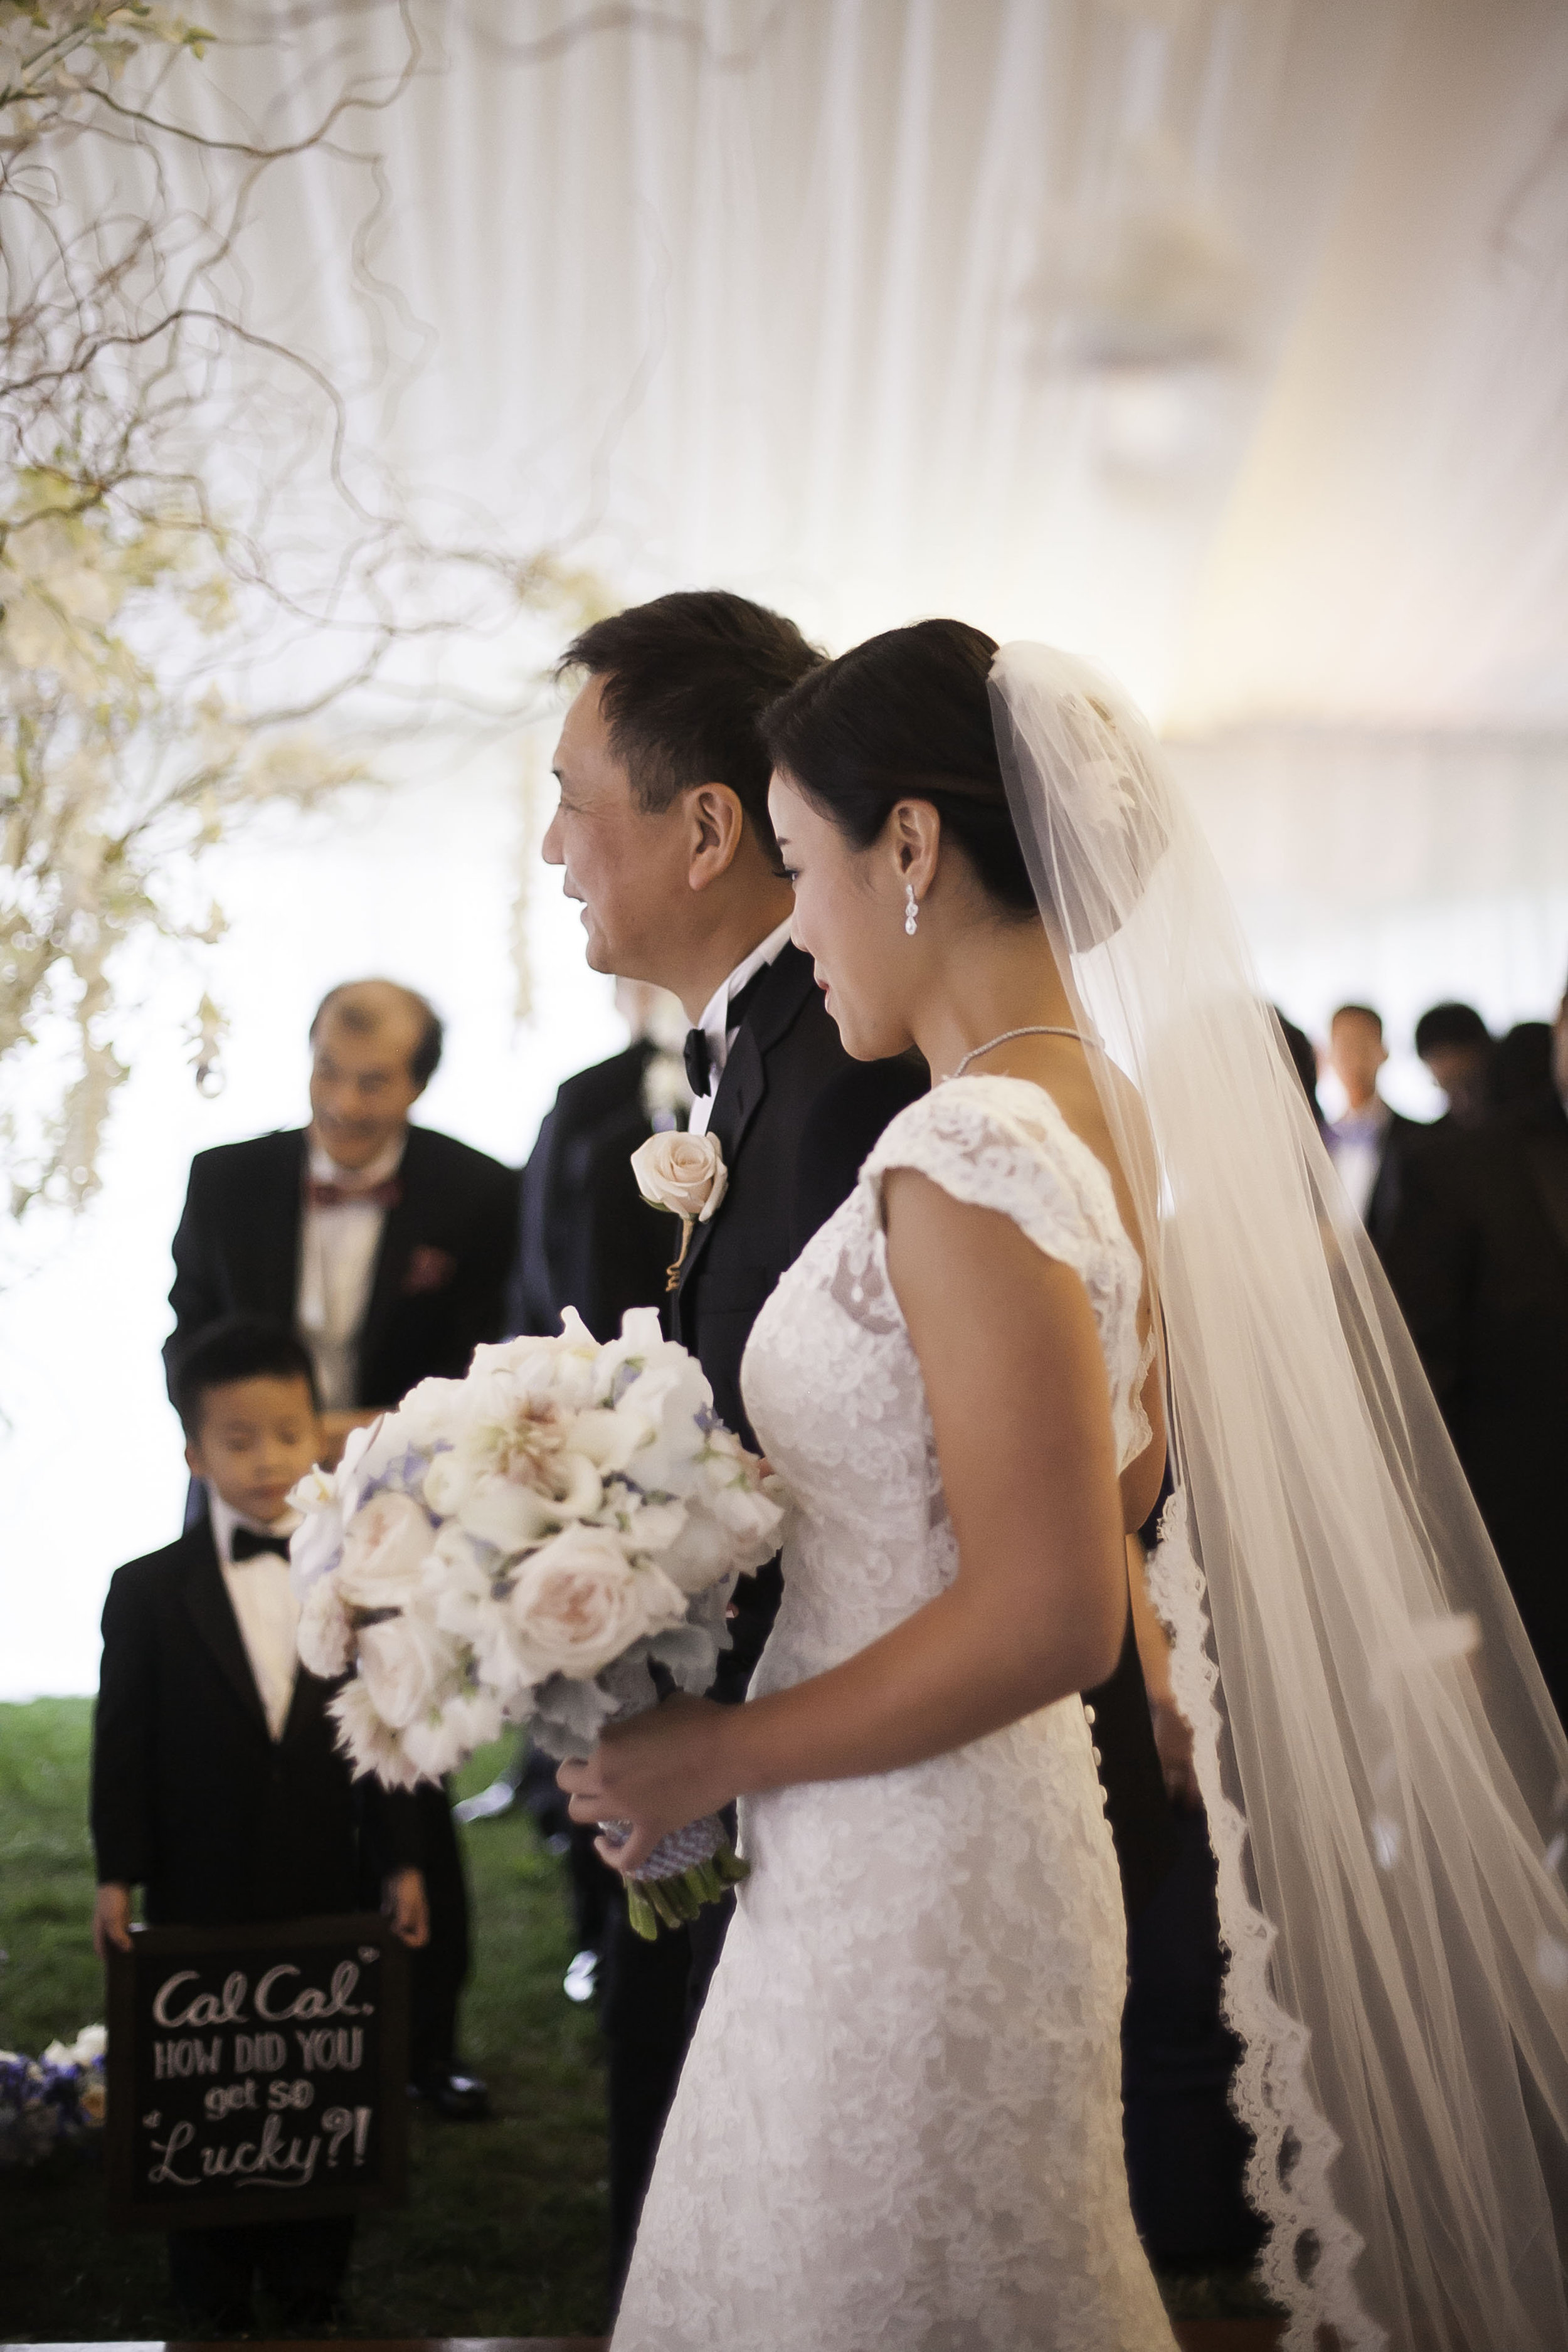 Courtney Calvin s Wedding 10 8 14-1court and cal wedding day-0605.jpg